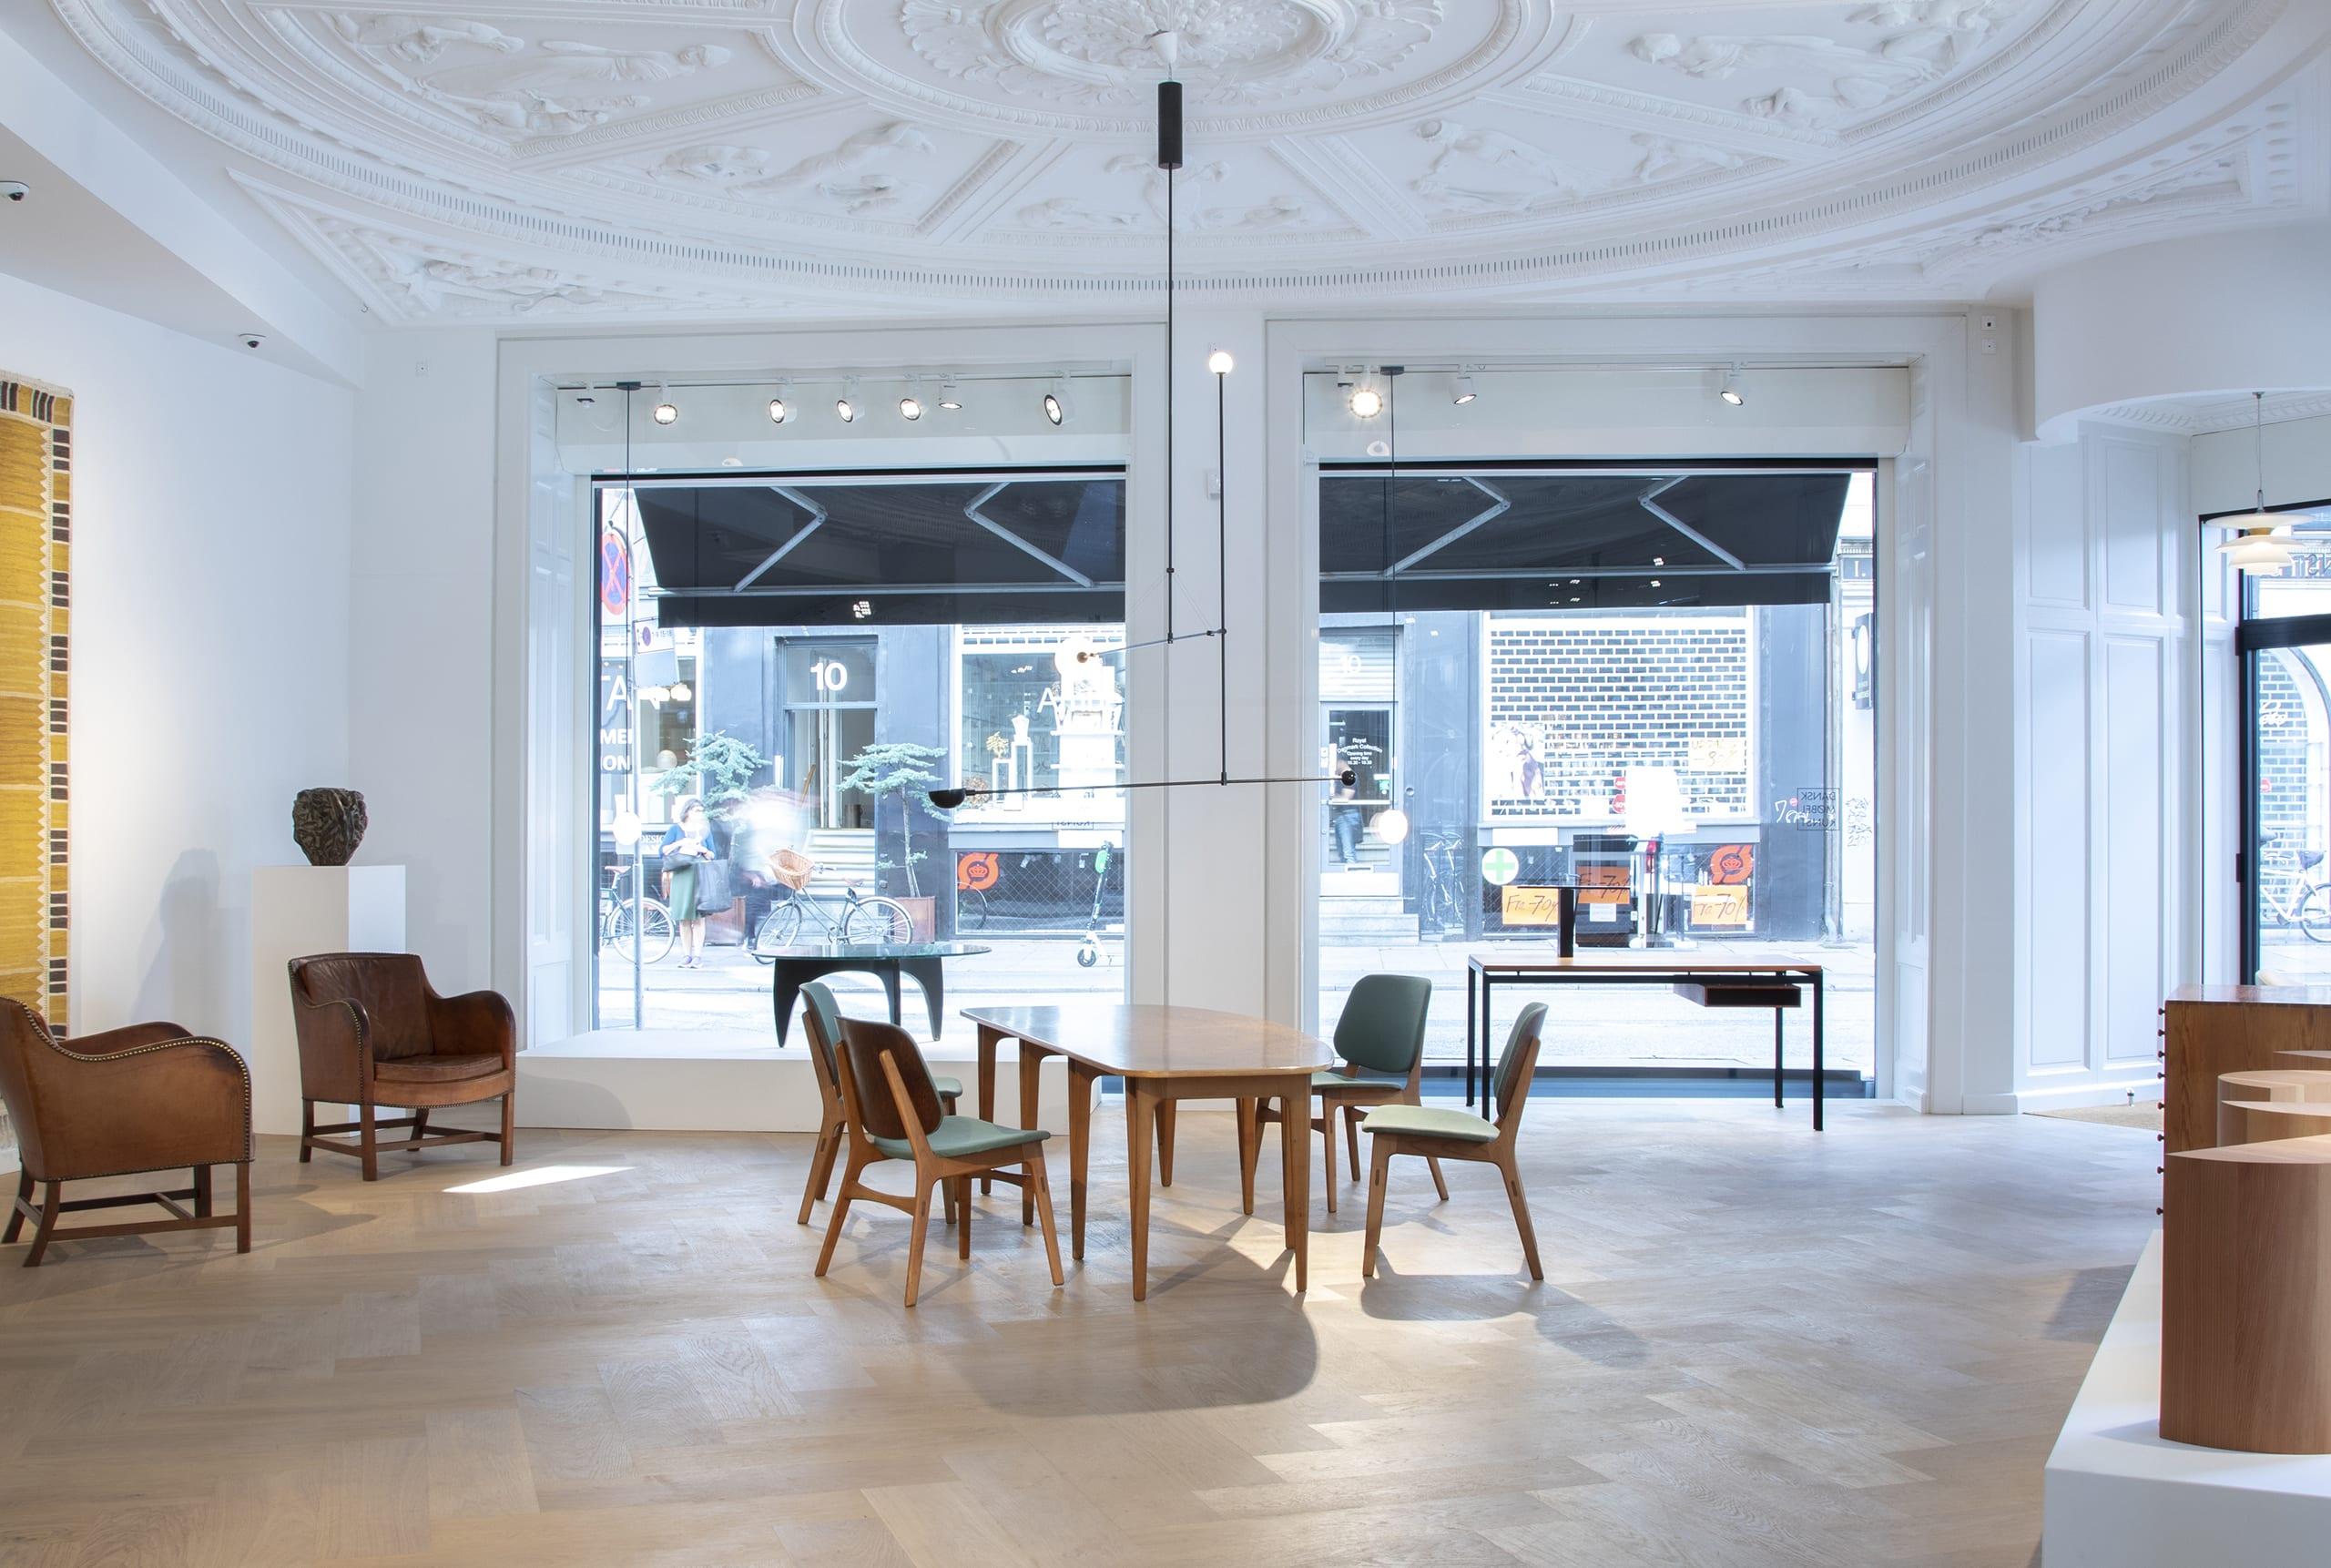 Copenhagen Gallery - Michael Anastassiades and original works of Nordic design by Dansk Møbelkunst